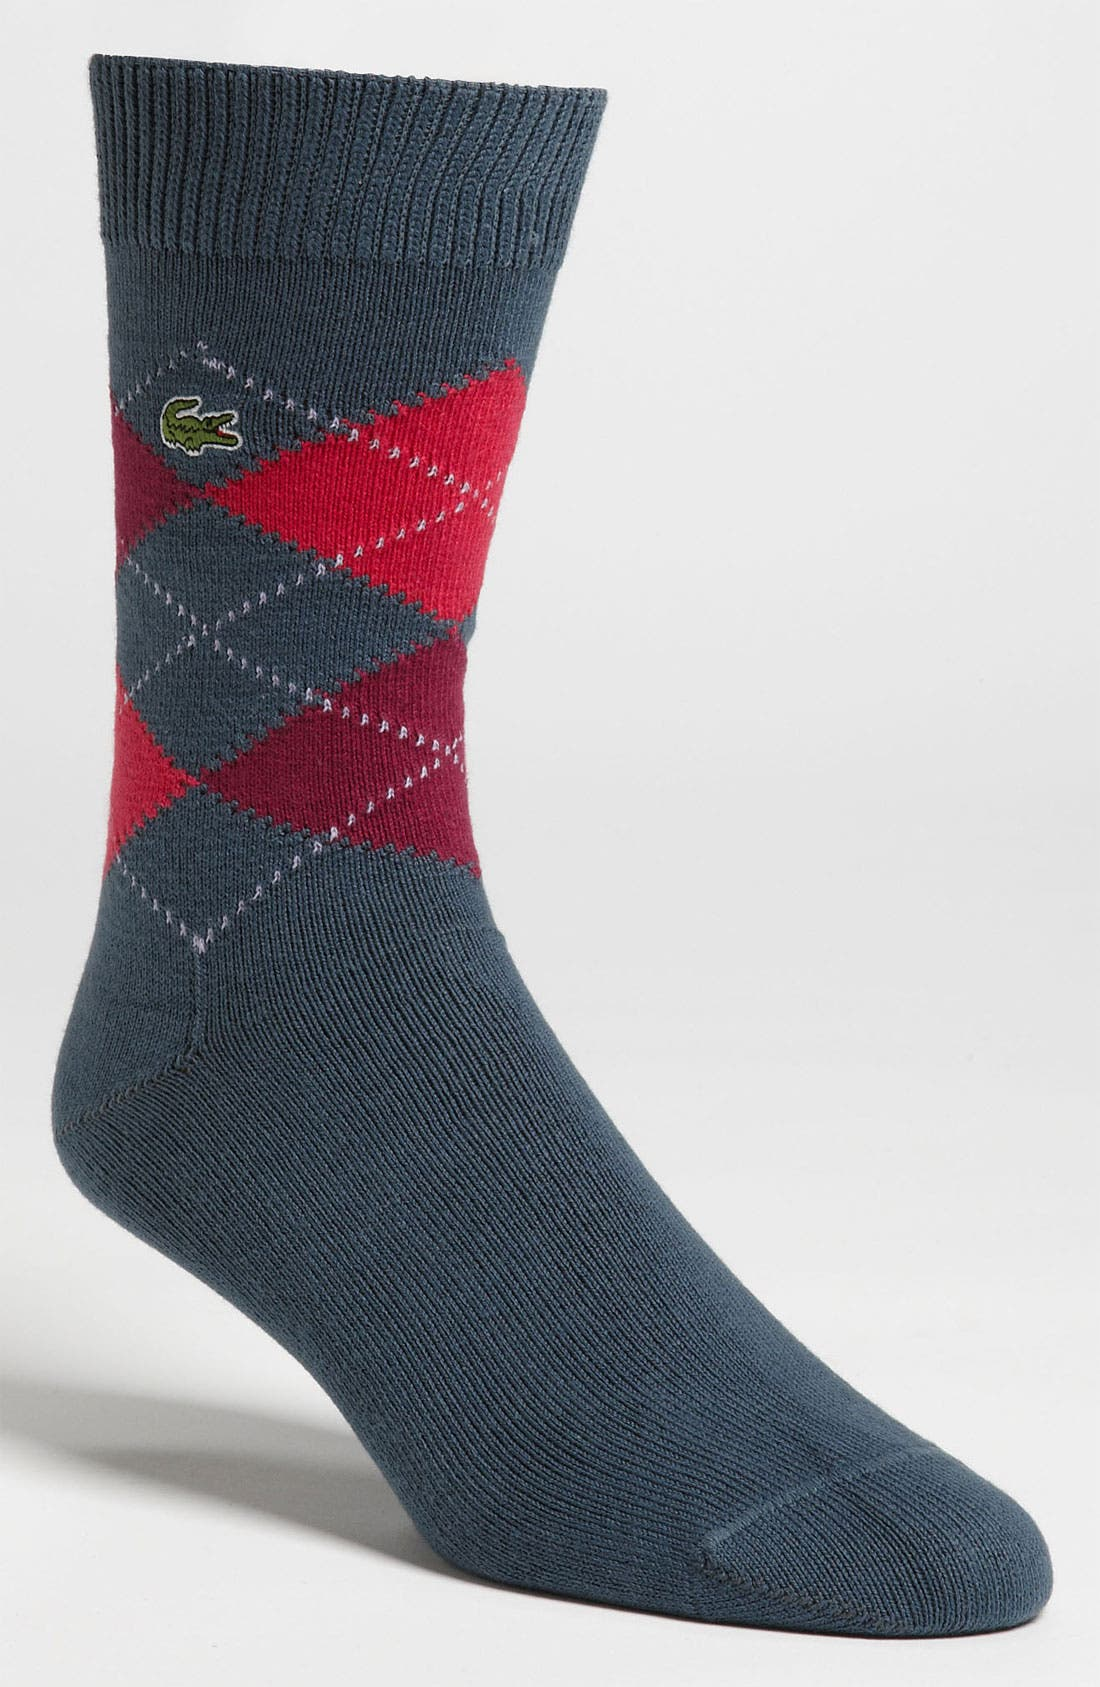 Alternate Image 1 Selected - Lacoste Argyle Crew Socks